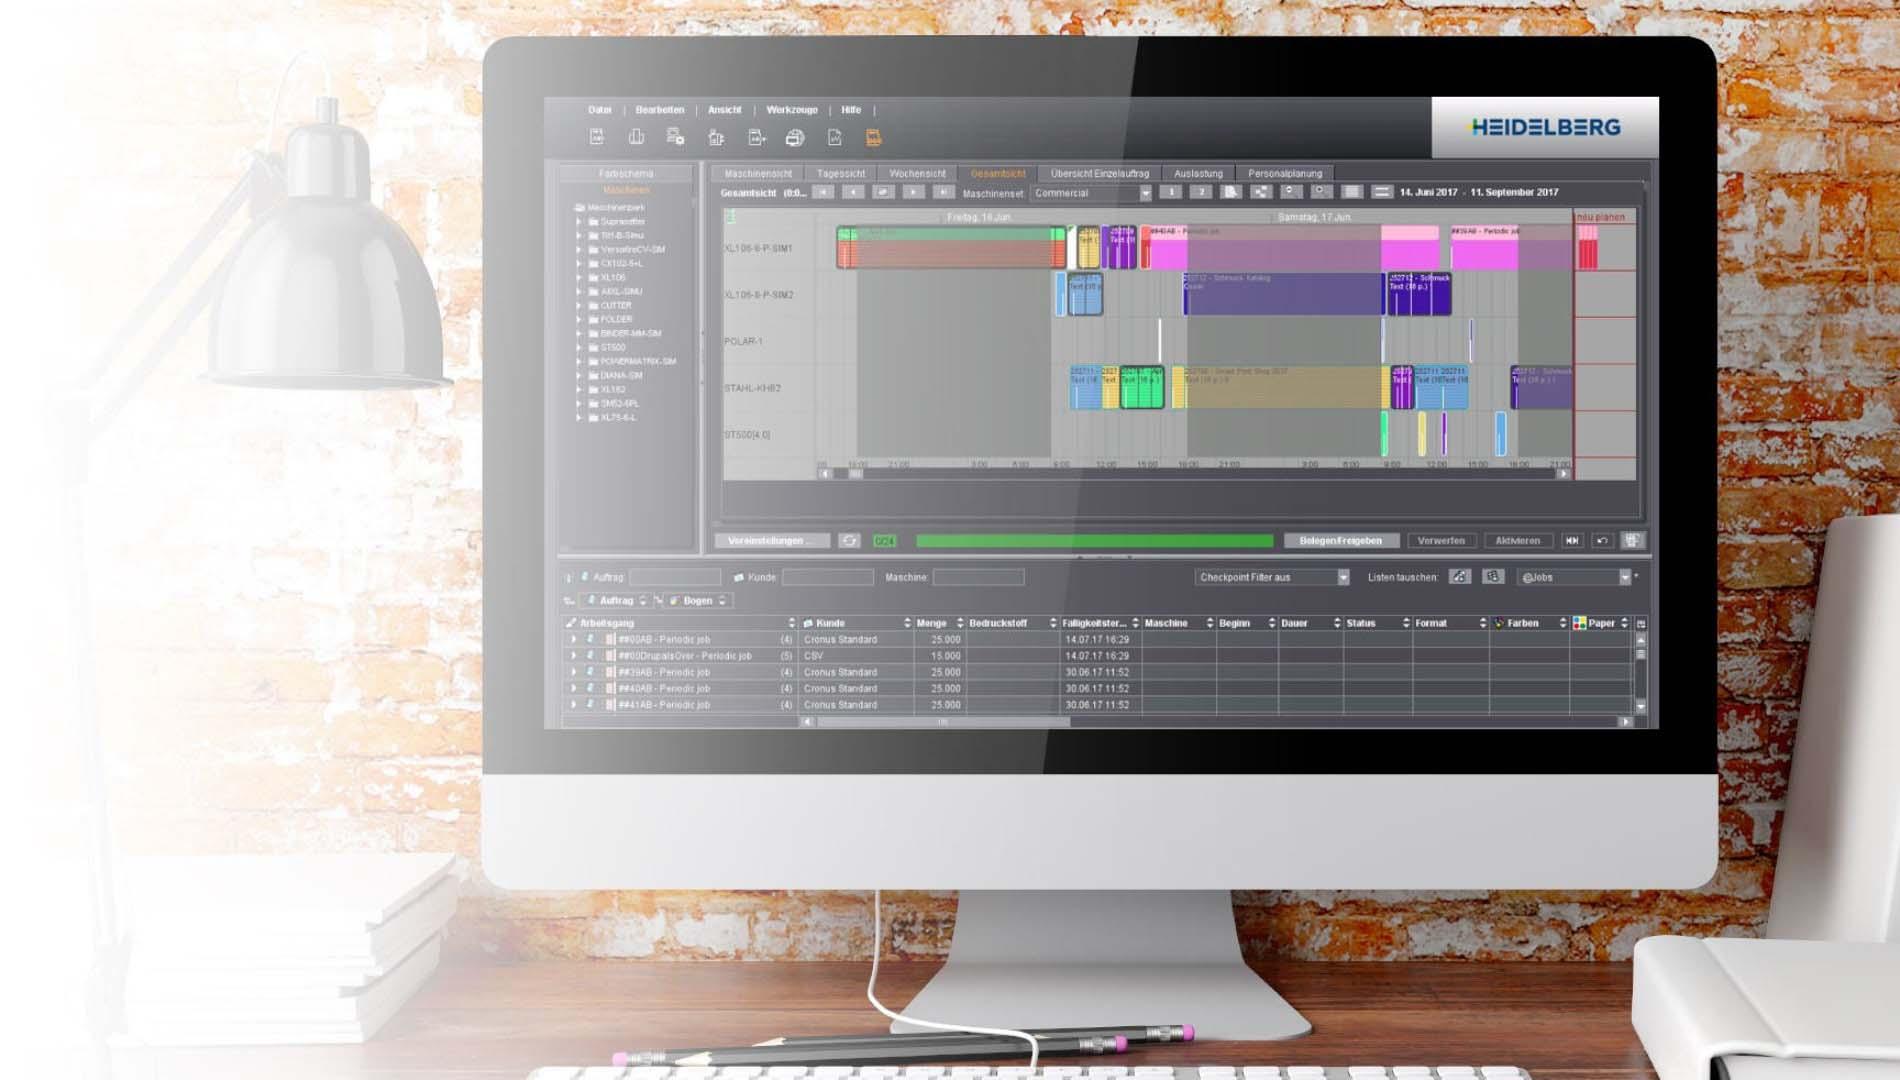 Heidelberg workflow & colour management